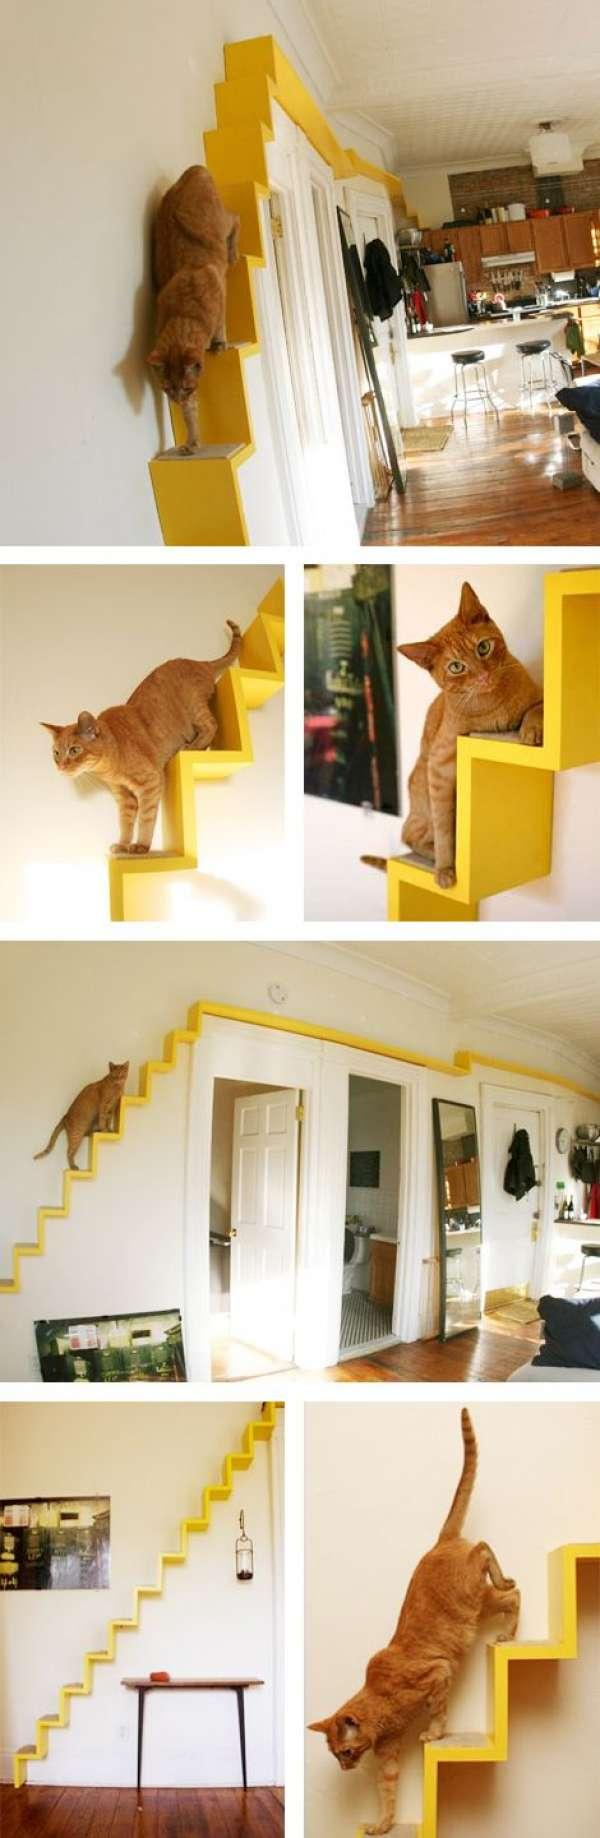 27 supers id es bricolage pour chats et chiens guide astuces. Black Bedroom Furniture Sets. Home Design Ideas